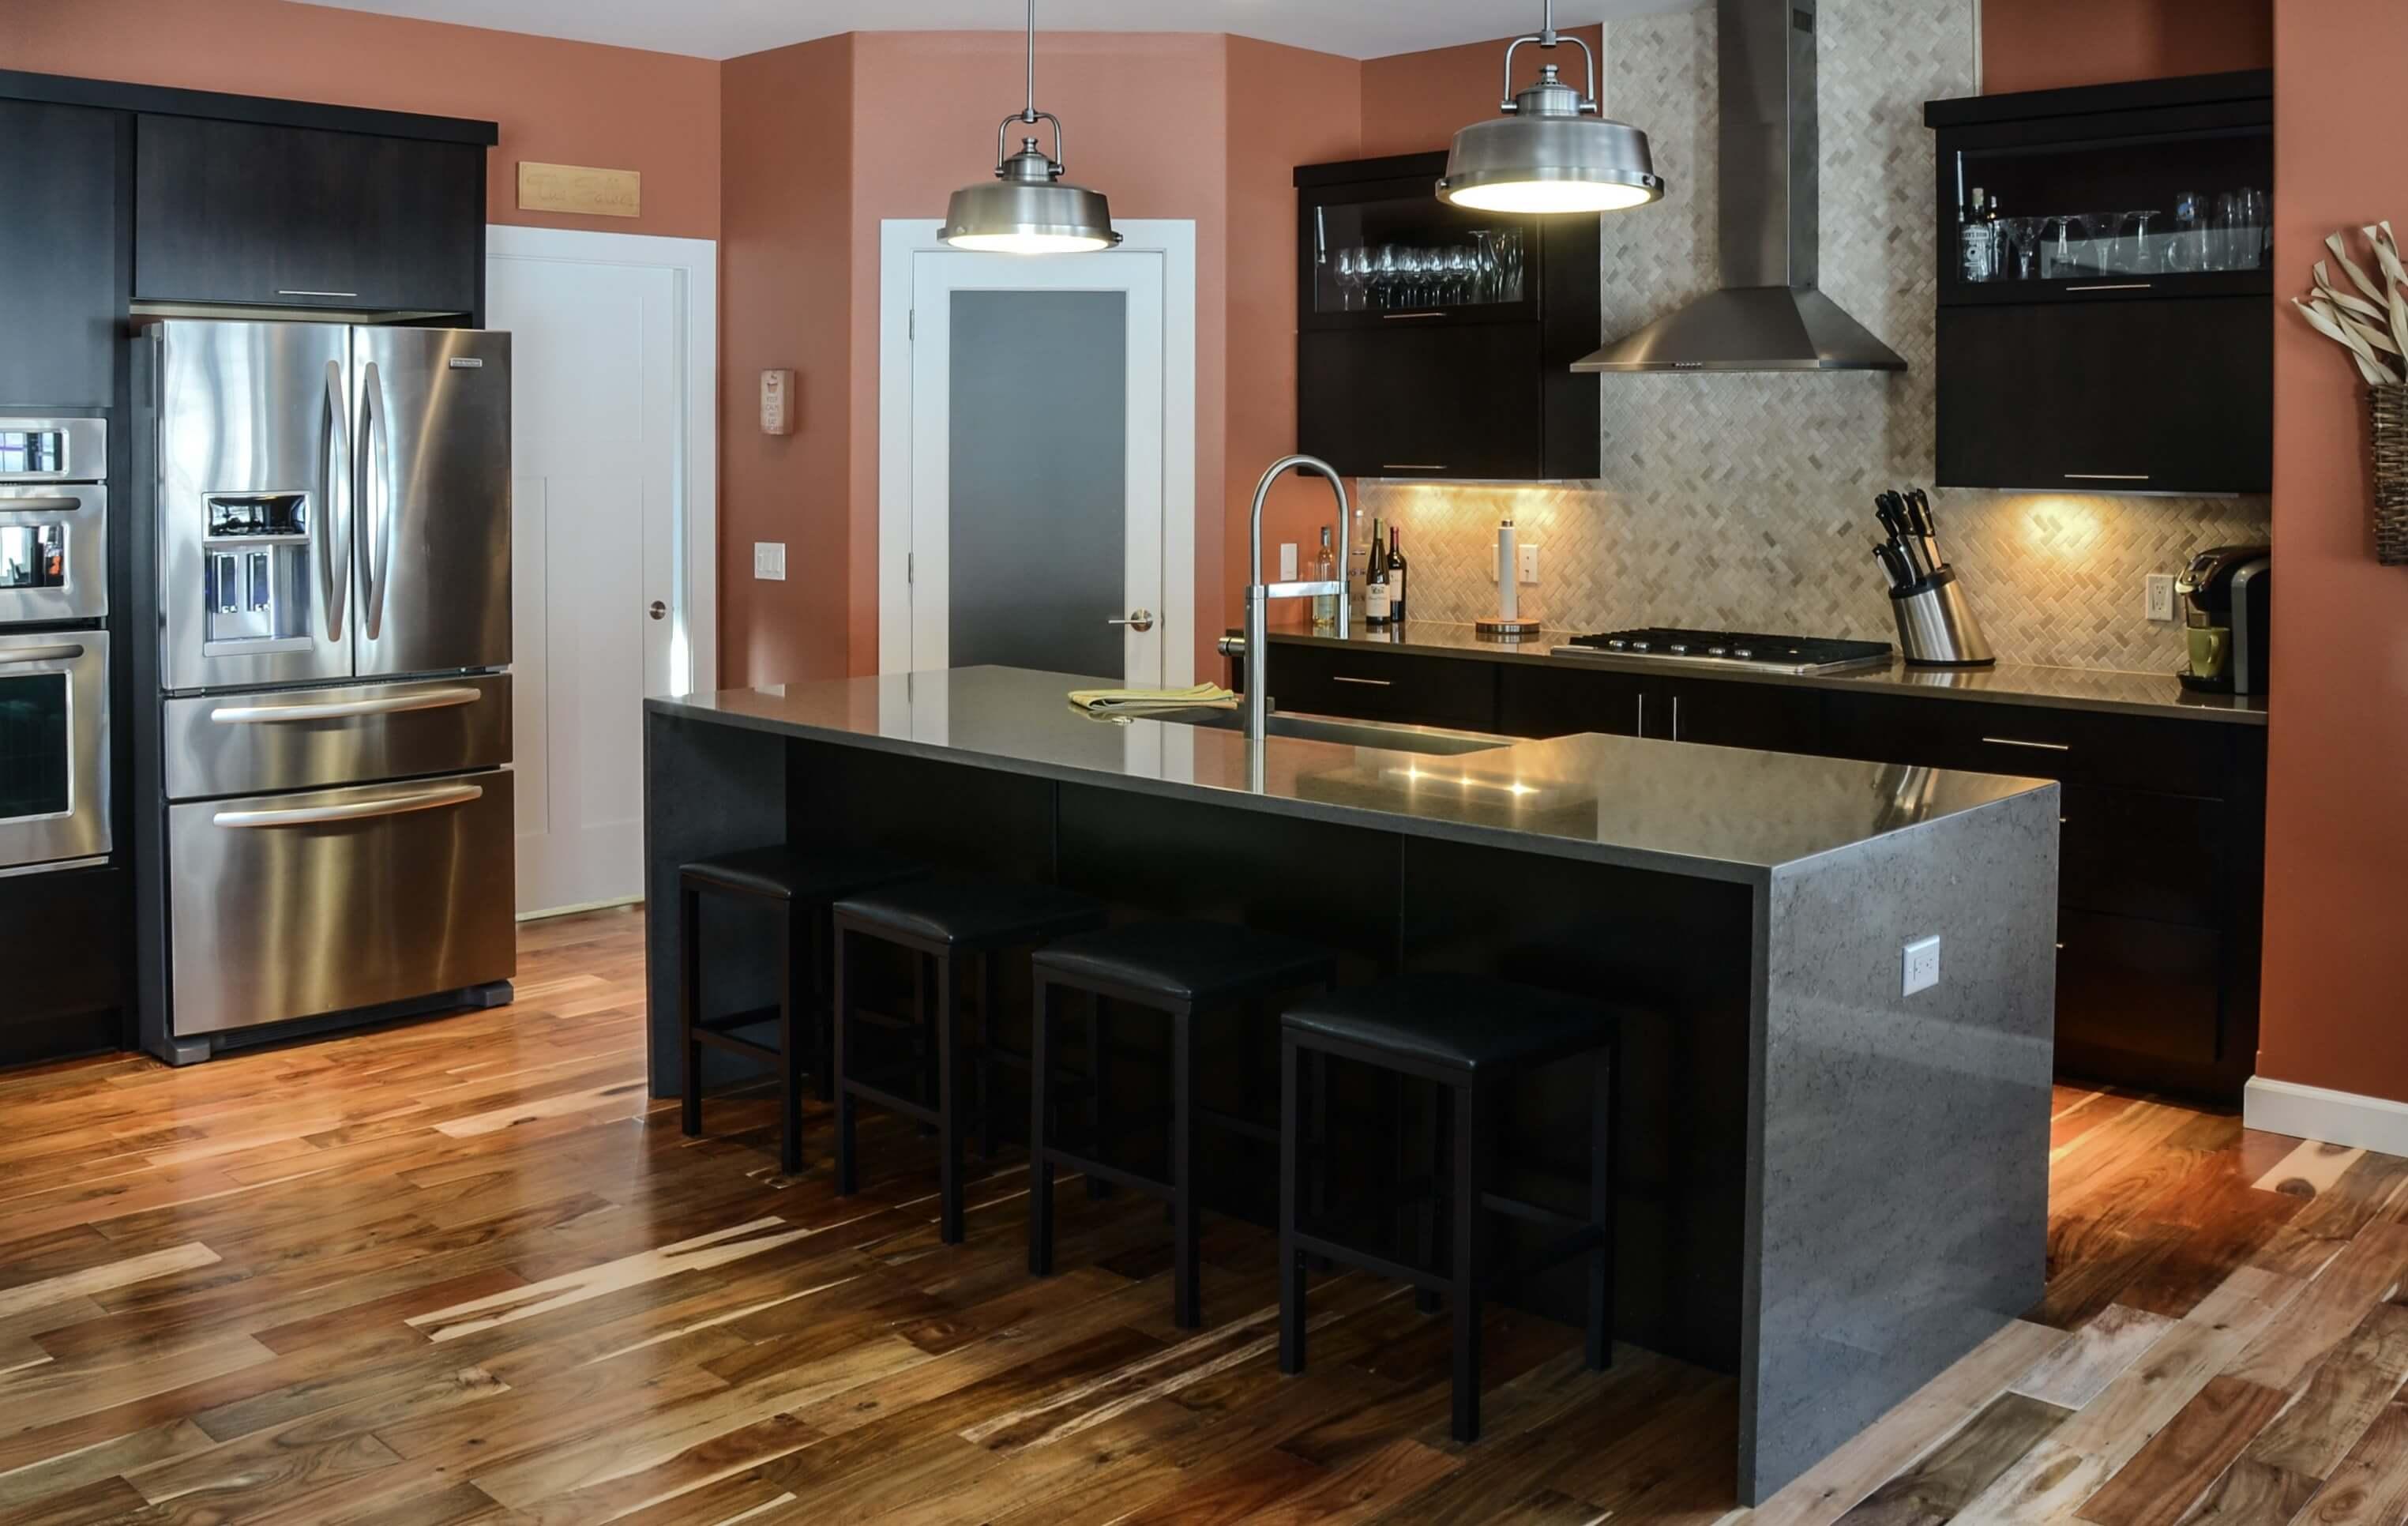 Kitchen Cabinets Schoenwalder Plumbing